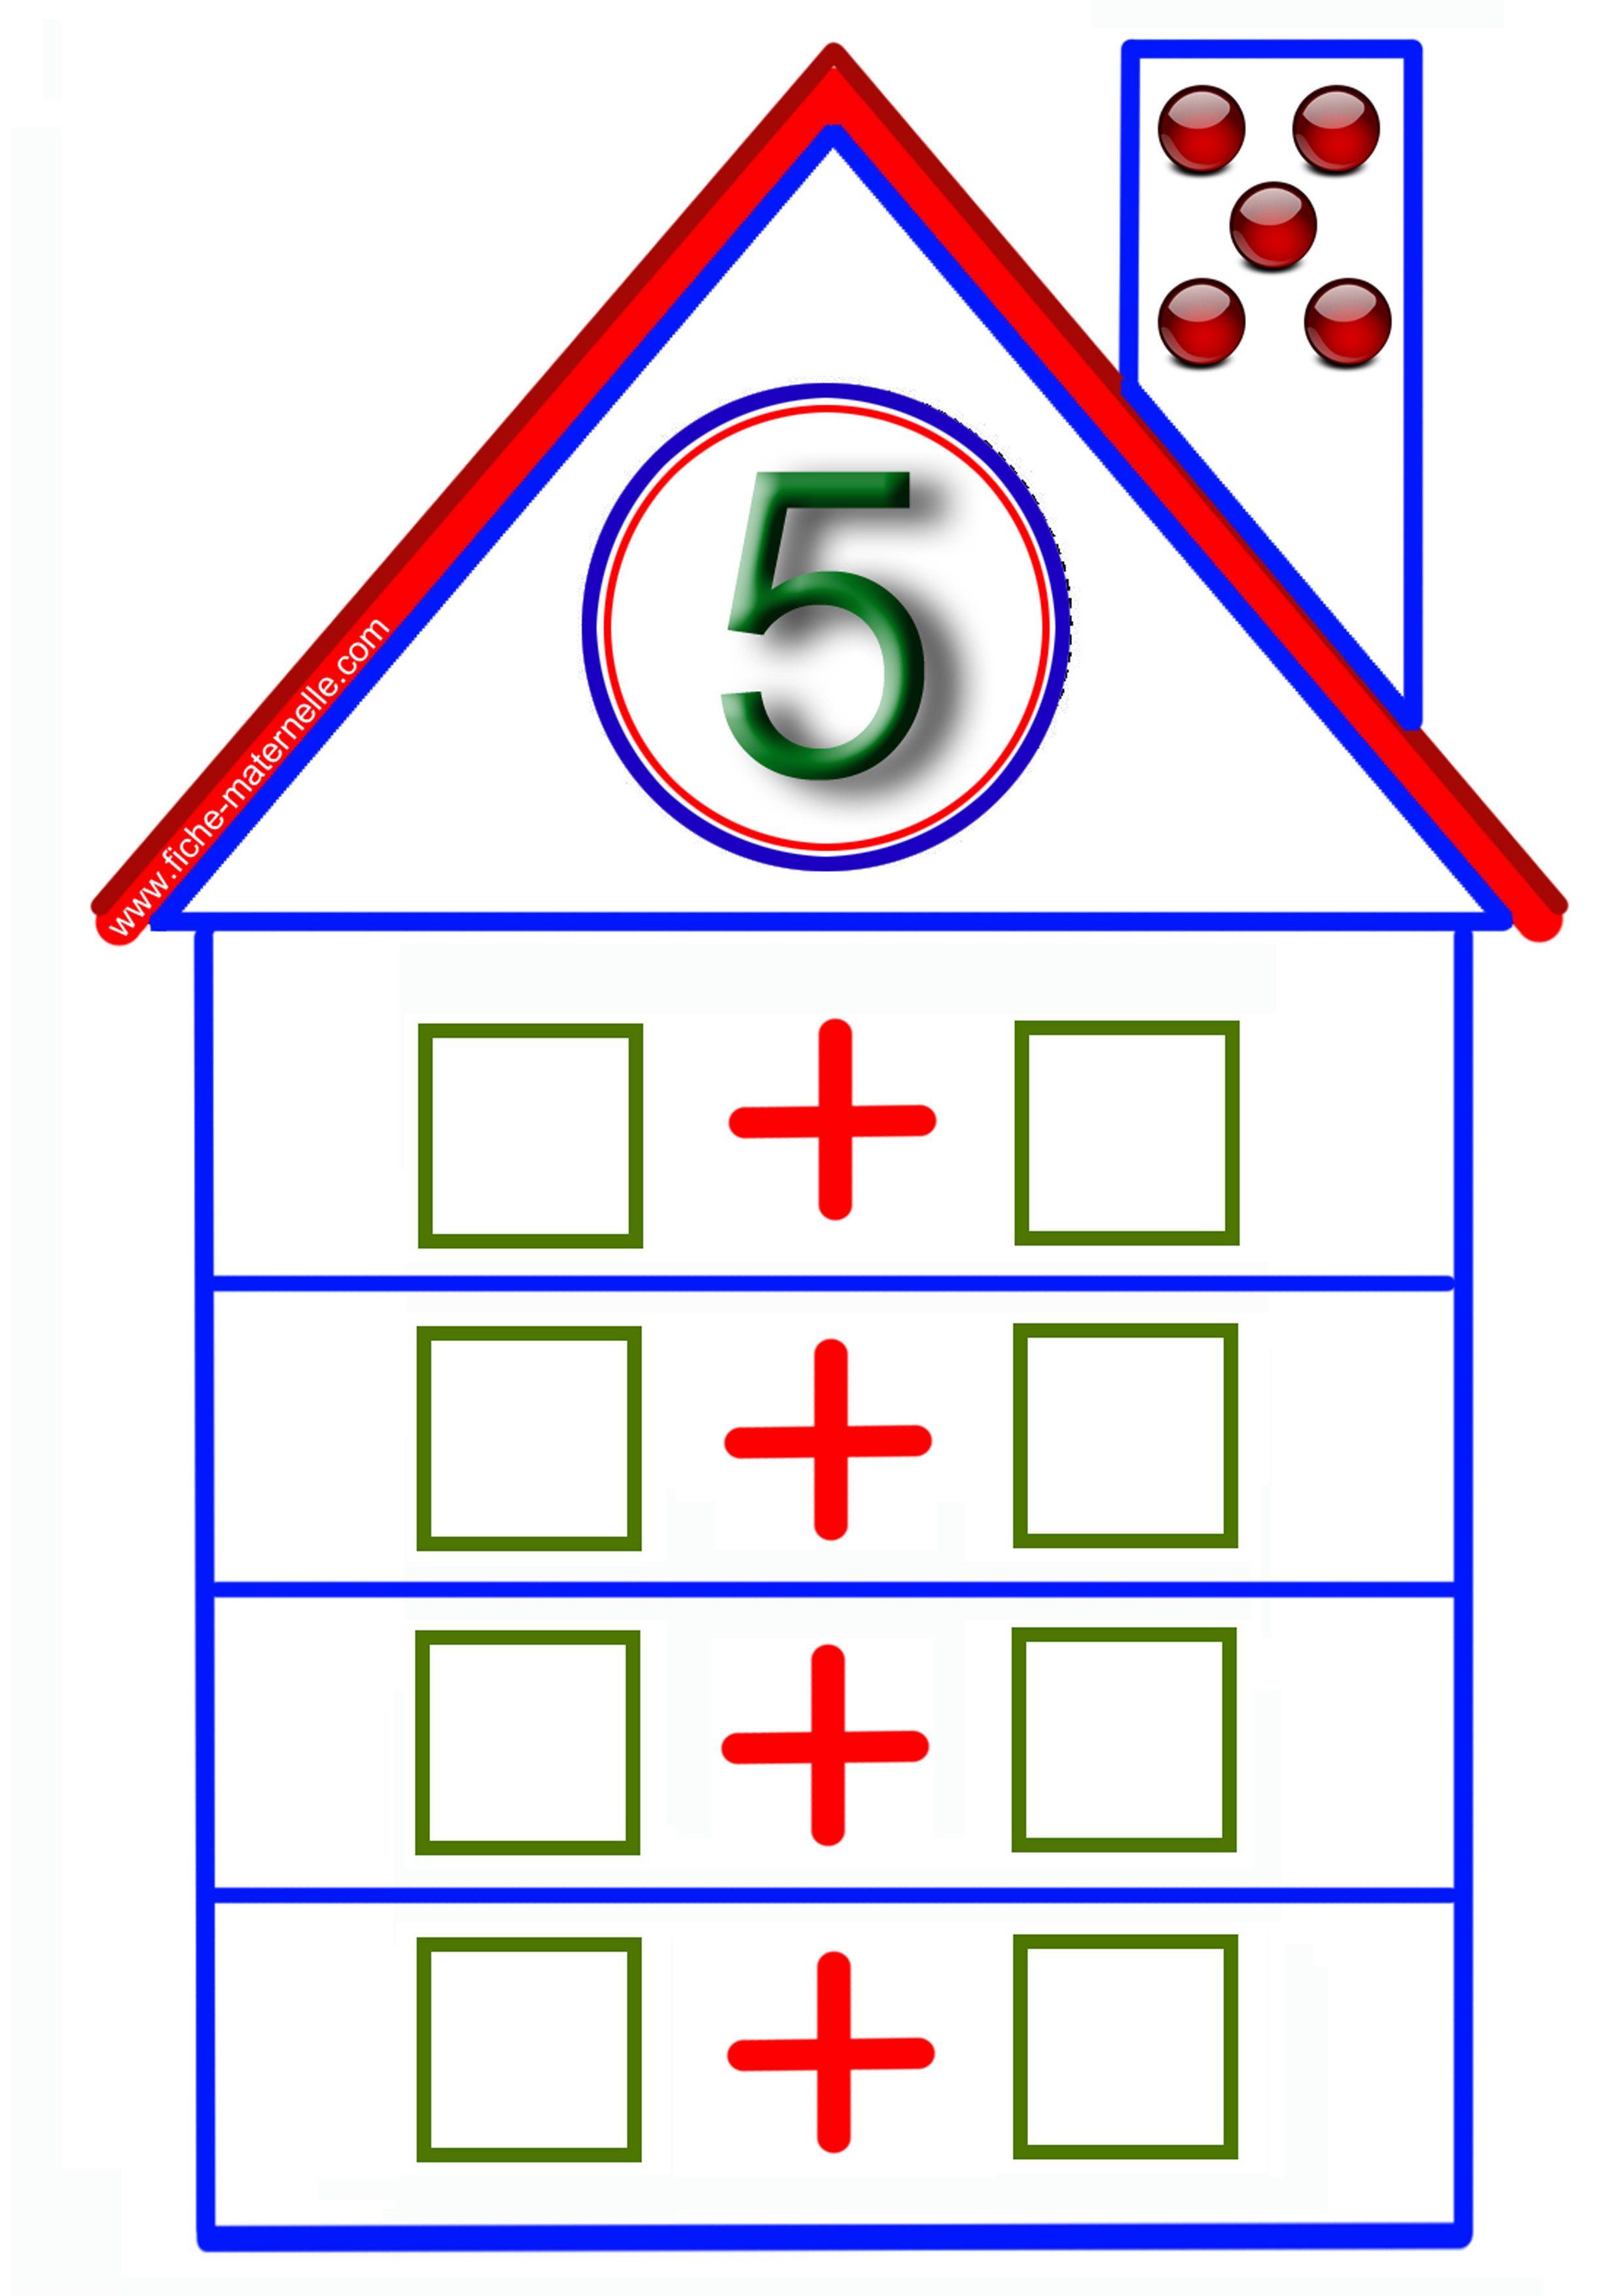 Juego matematico. Descomponer numeros | Abn | Pinterest | Mathe ...